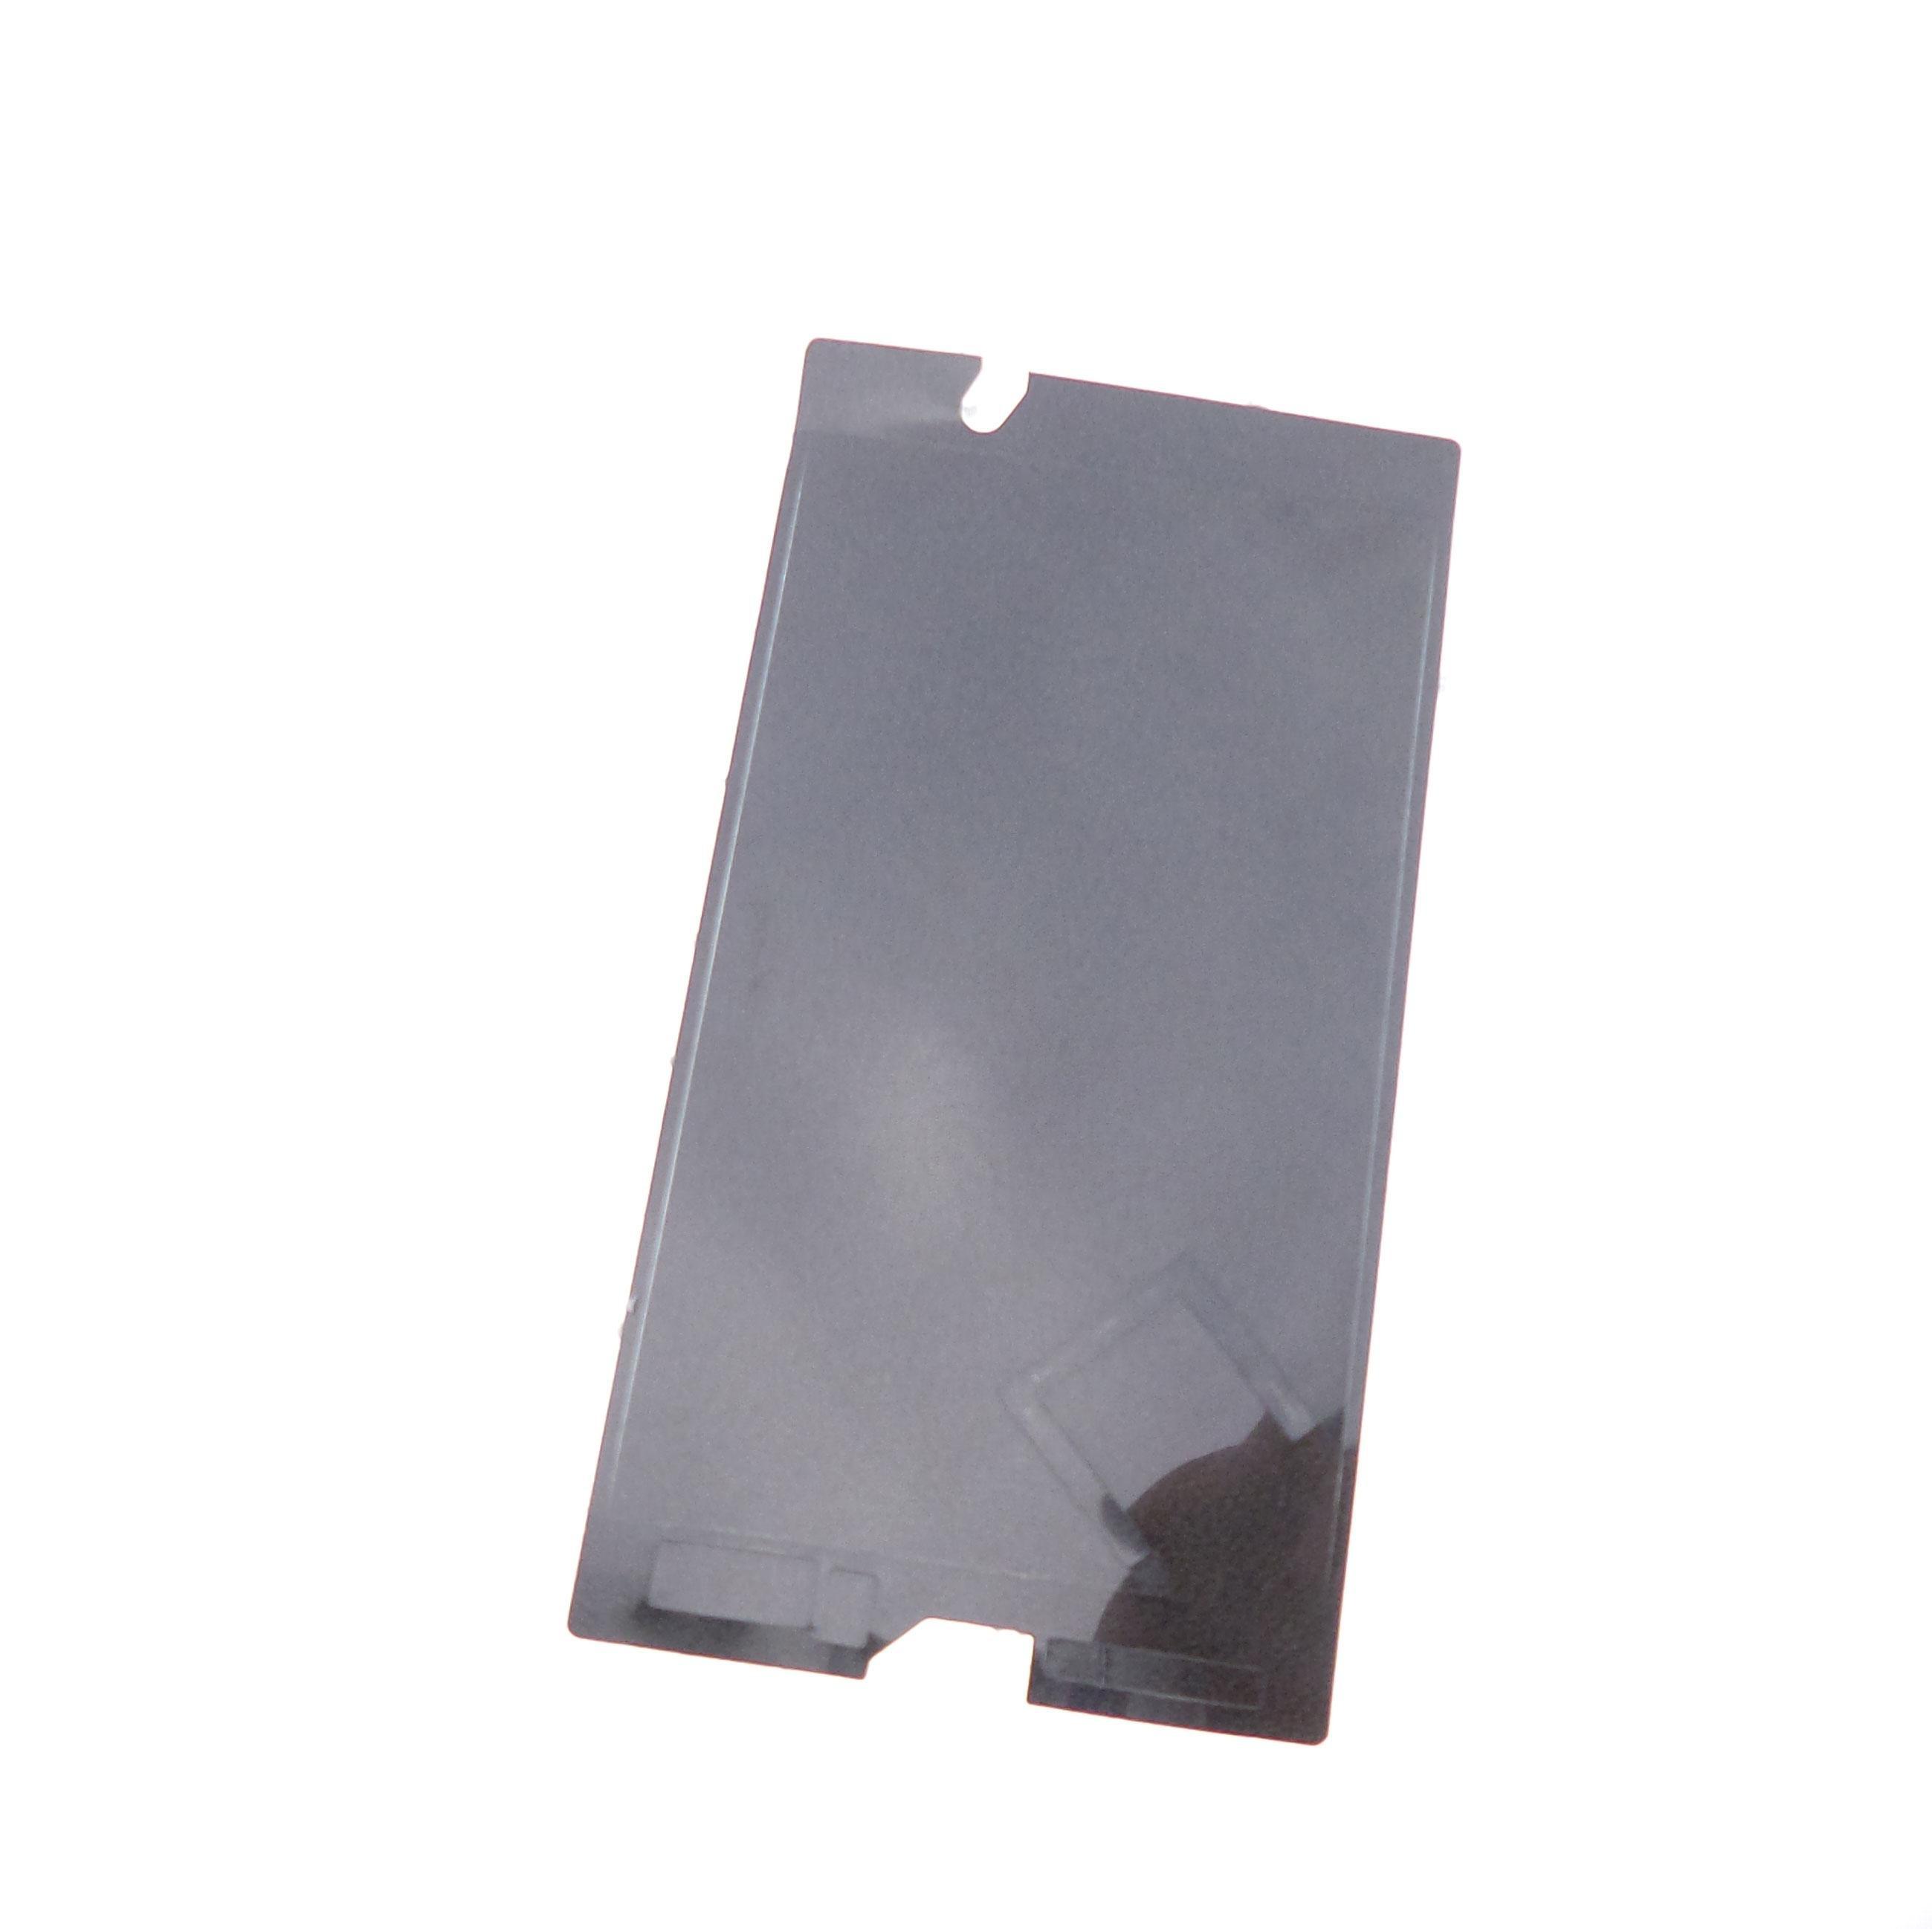 Adhésif prédécoupé LCD-support tactile Nokia Lumia 520